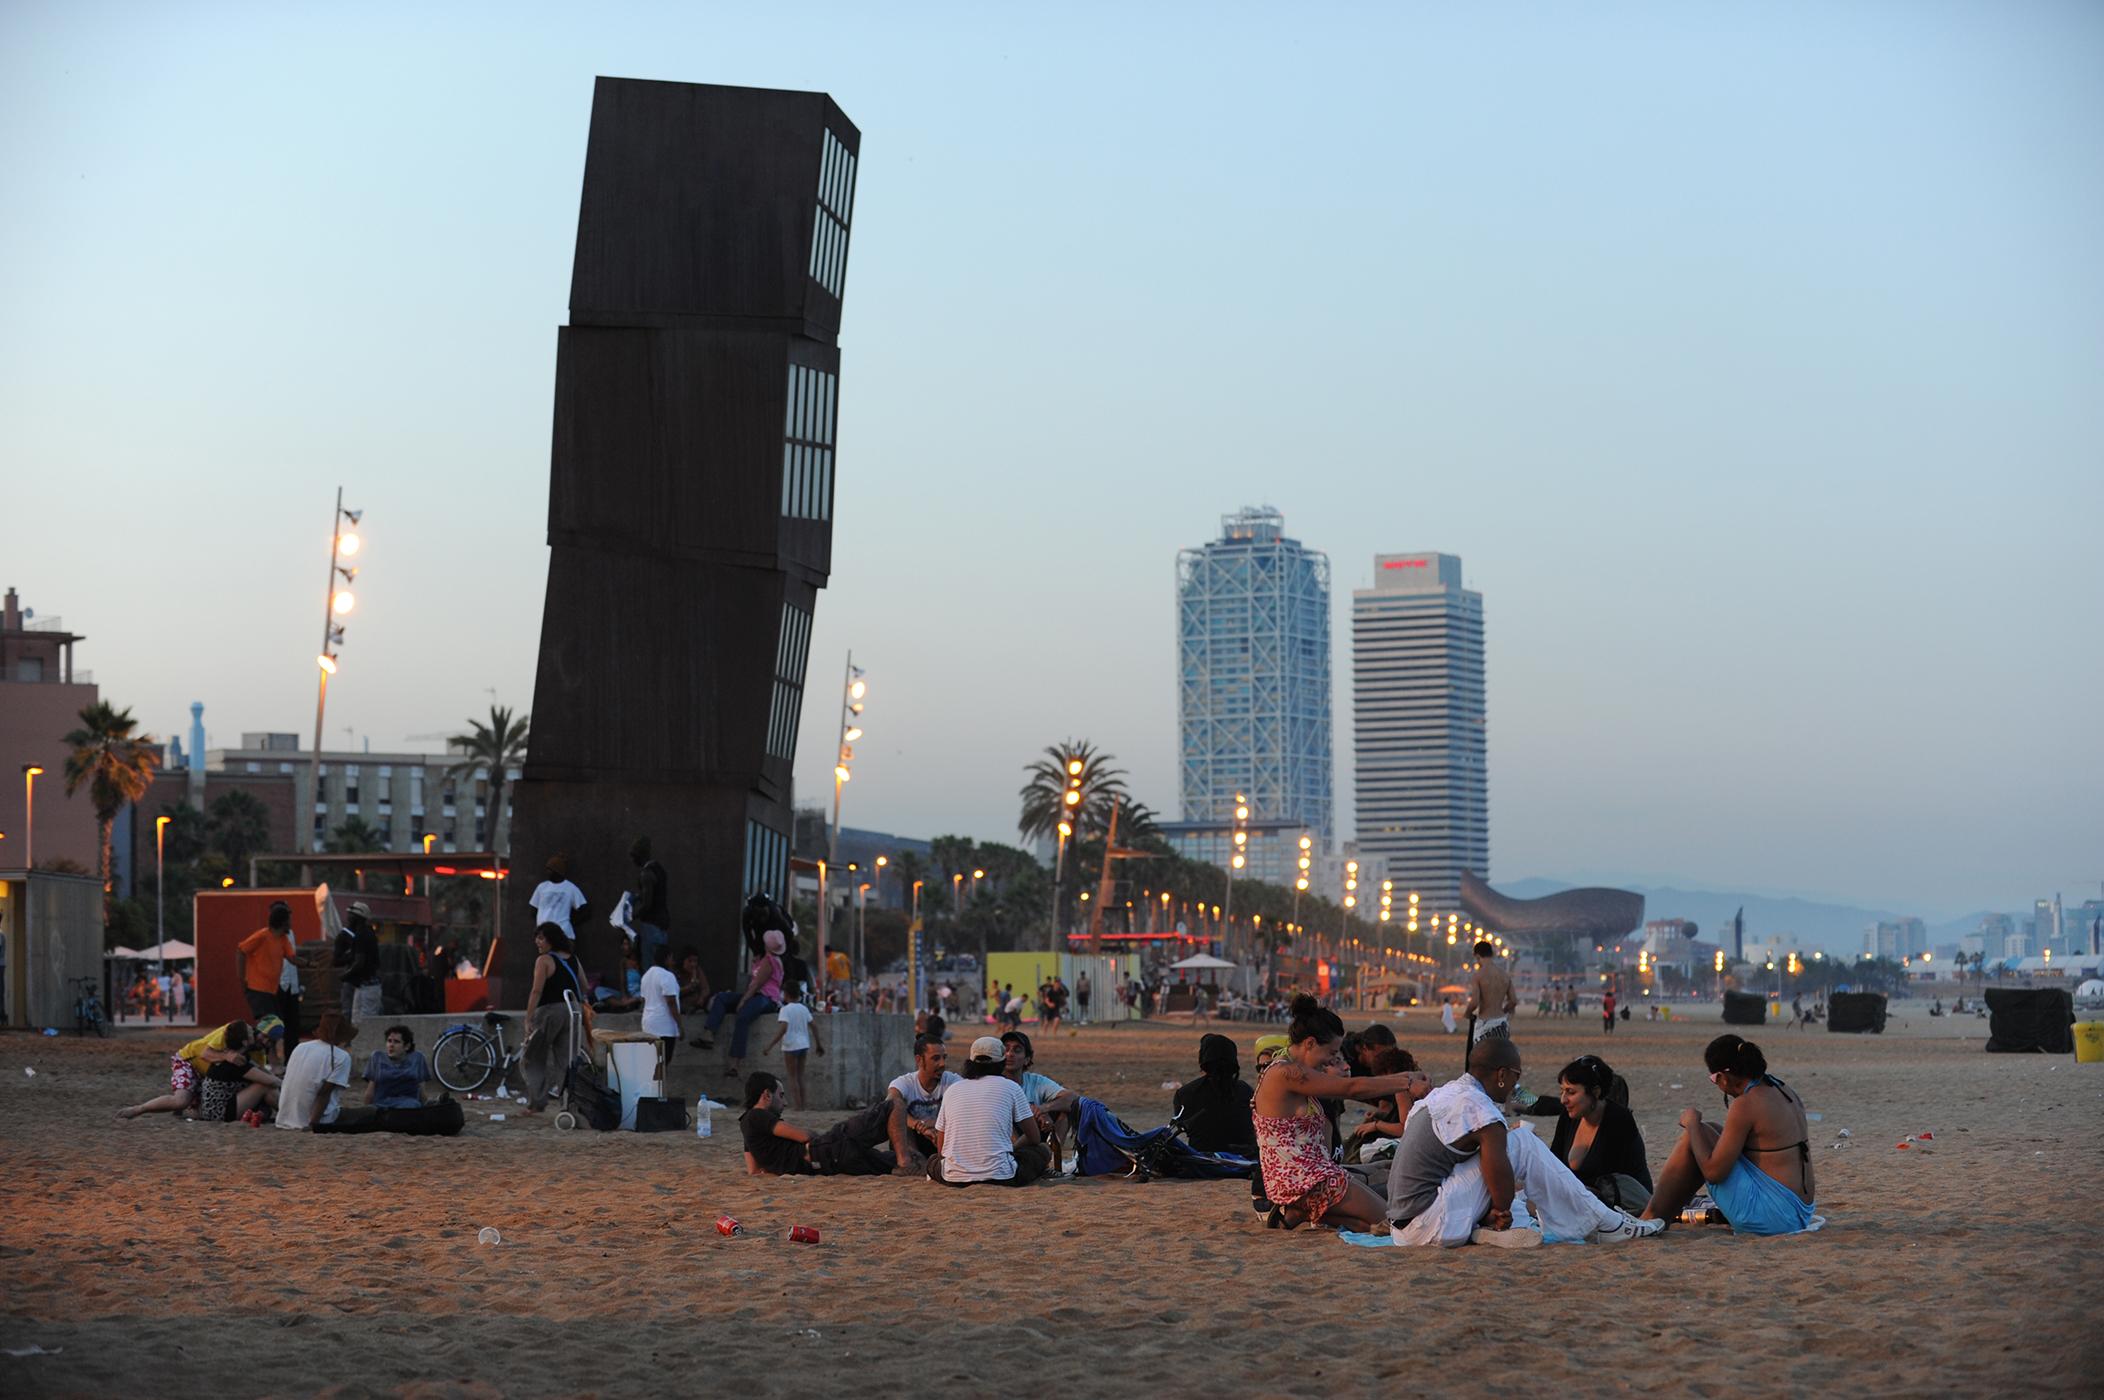 Barcelona, Espanja, ranta, meri, ilta, matka, matkablogi